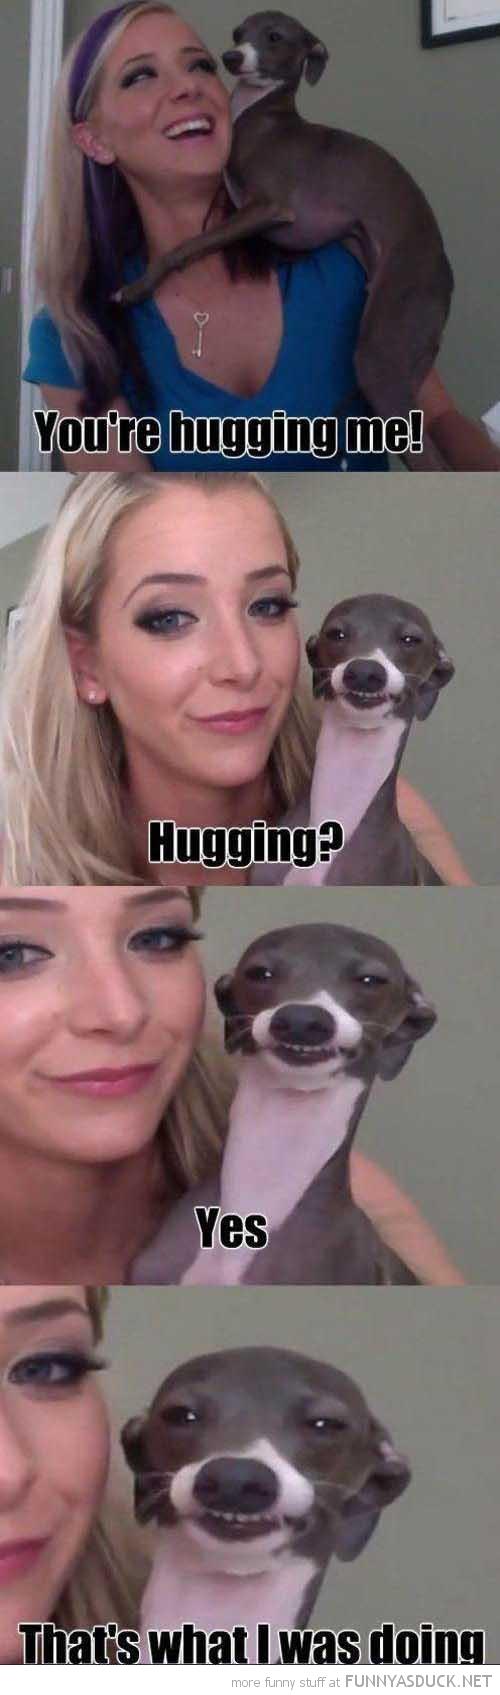 Hugging?